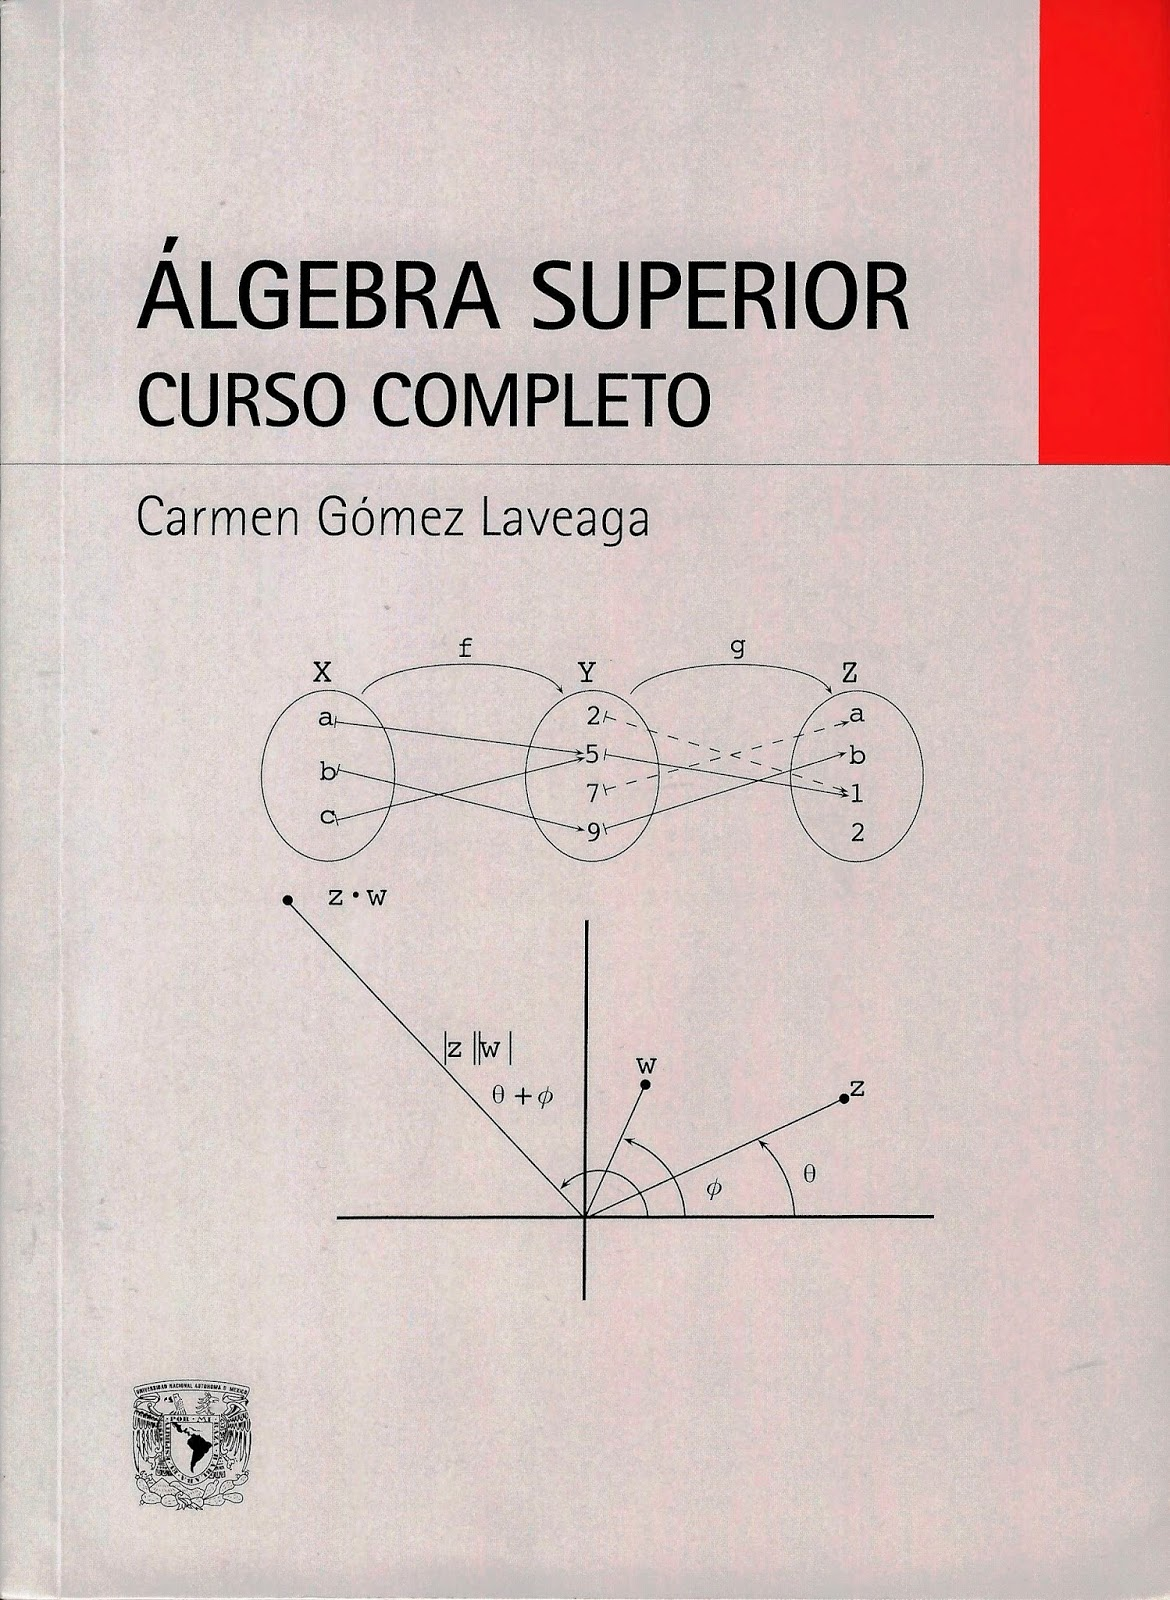 Álgebra superior curso completo – Carmen Gómez Laveaga